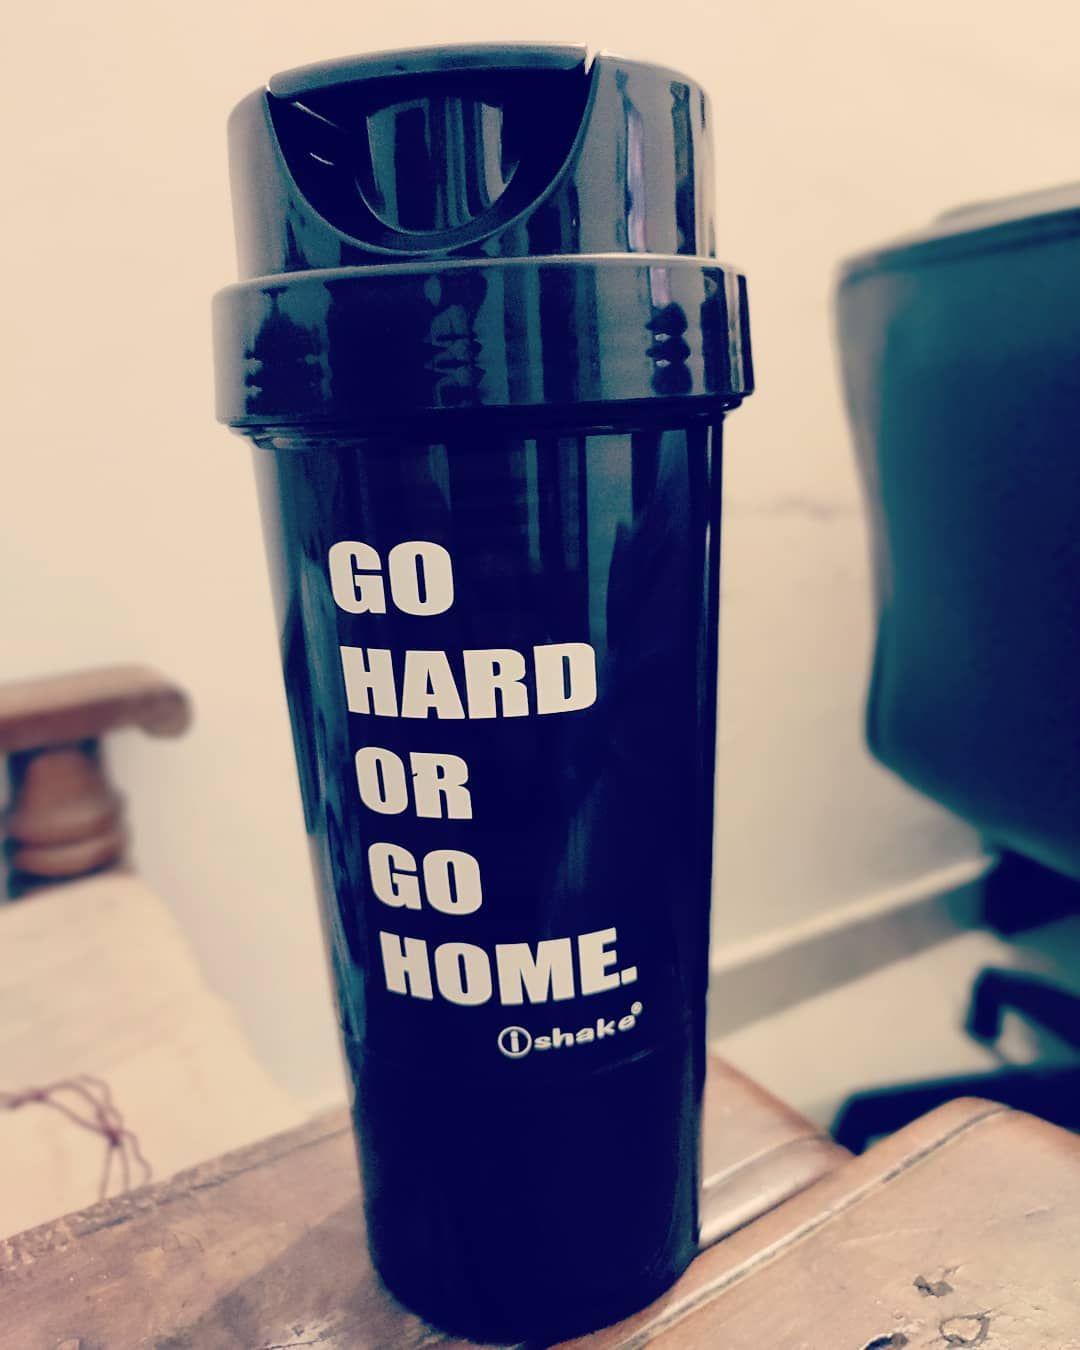 #fitnessgear #fitnessmotivation #fitnessfood #gymnast #healthy #fitnessfreak #fitnessmodel #gymfreak...